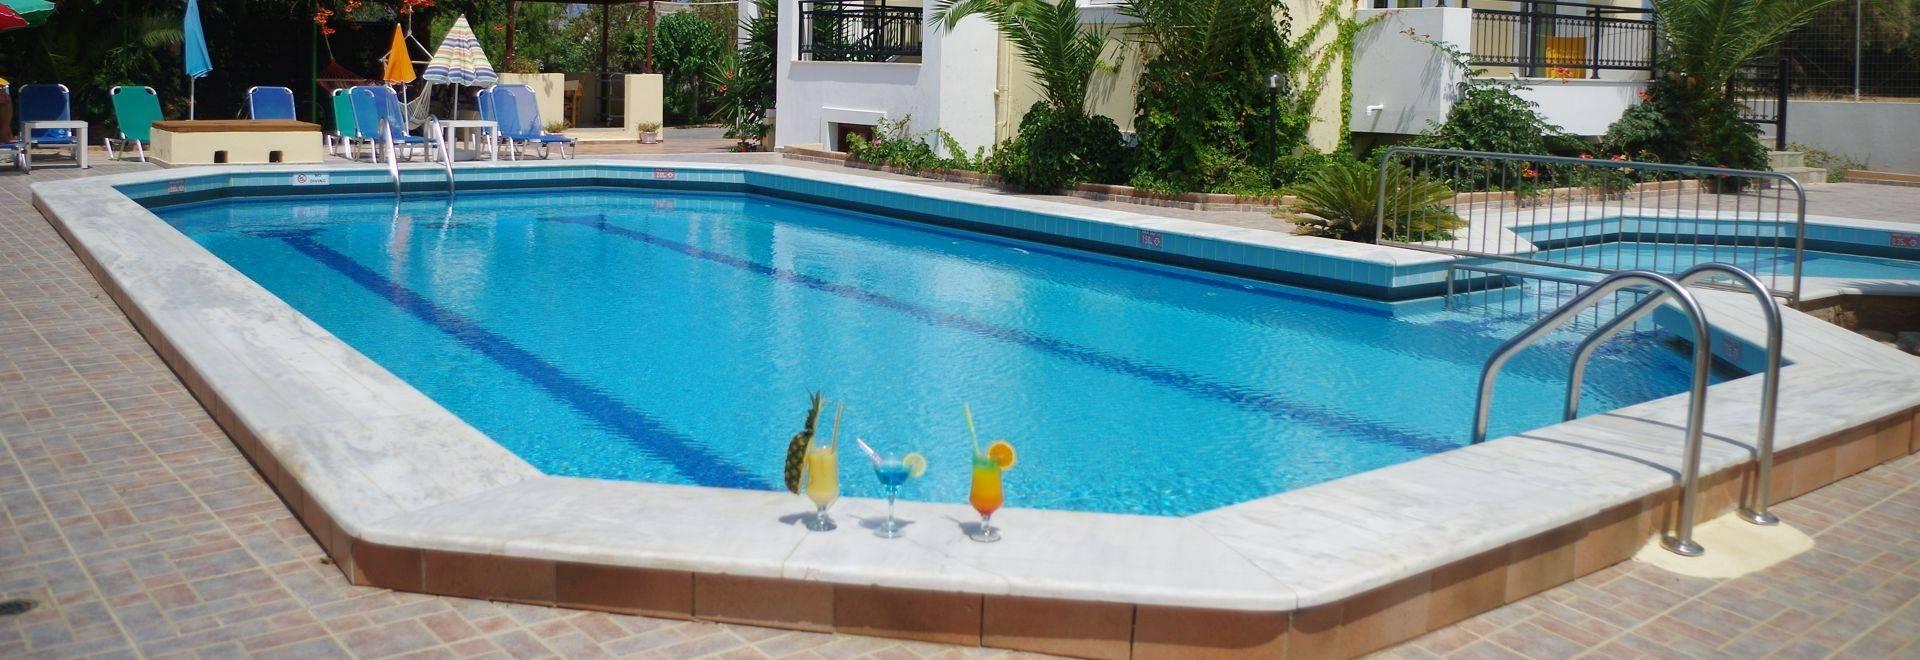 Iraklis Apartments in the resort Gouves, Crete. Greece